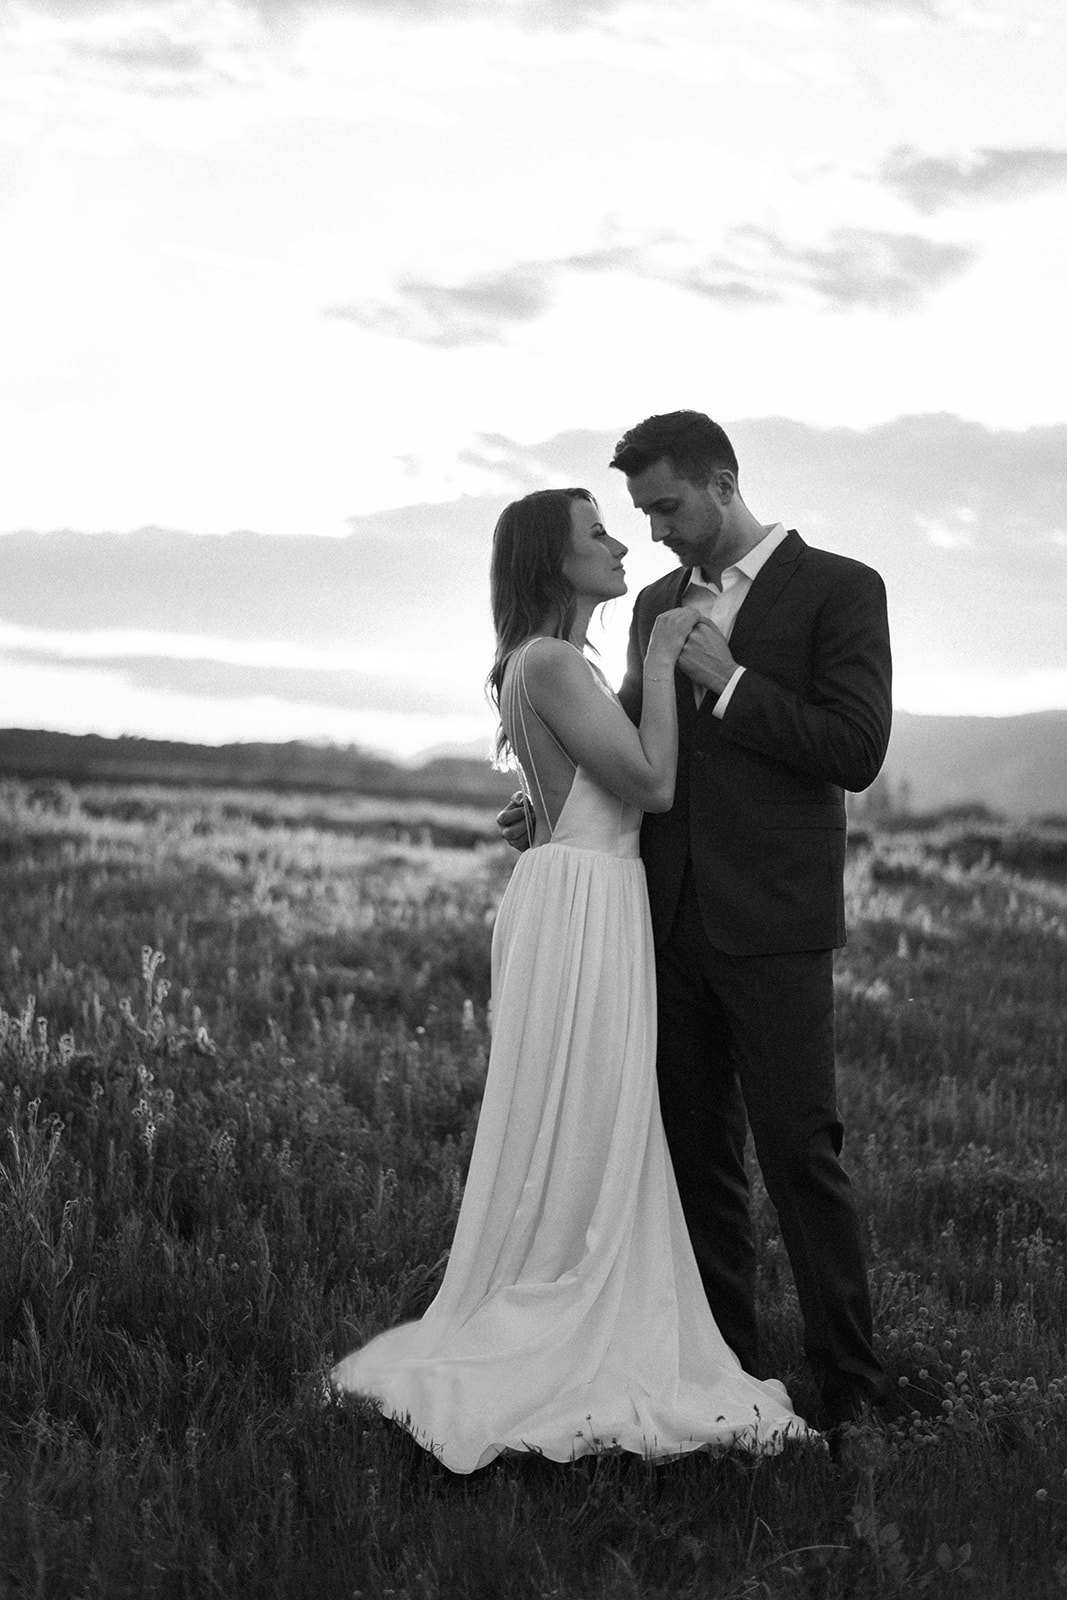 kamea_events_wedding_planner_portland_DeusAmor111.jpg